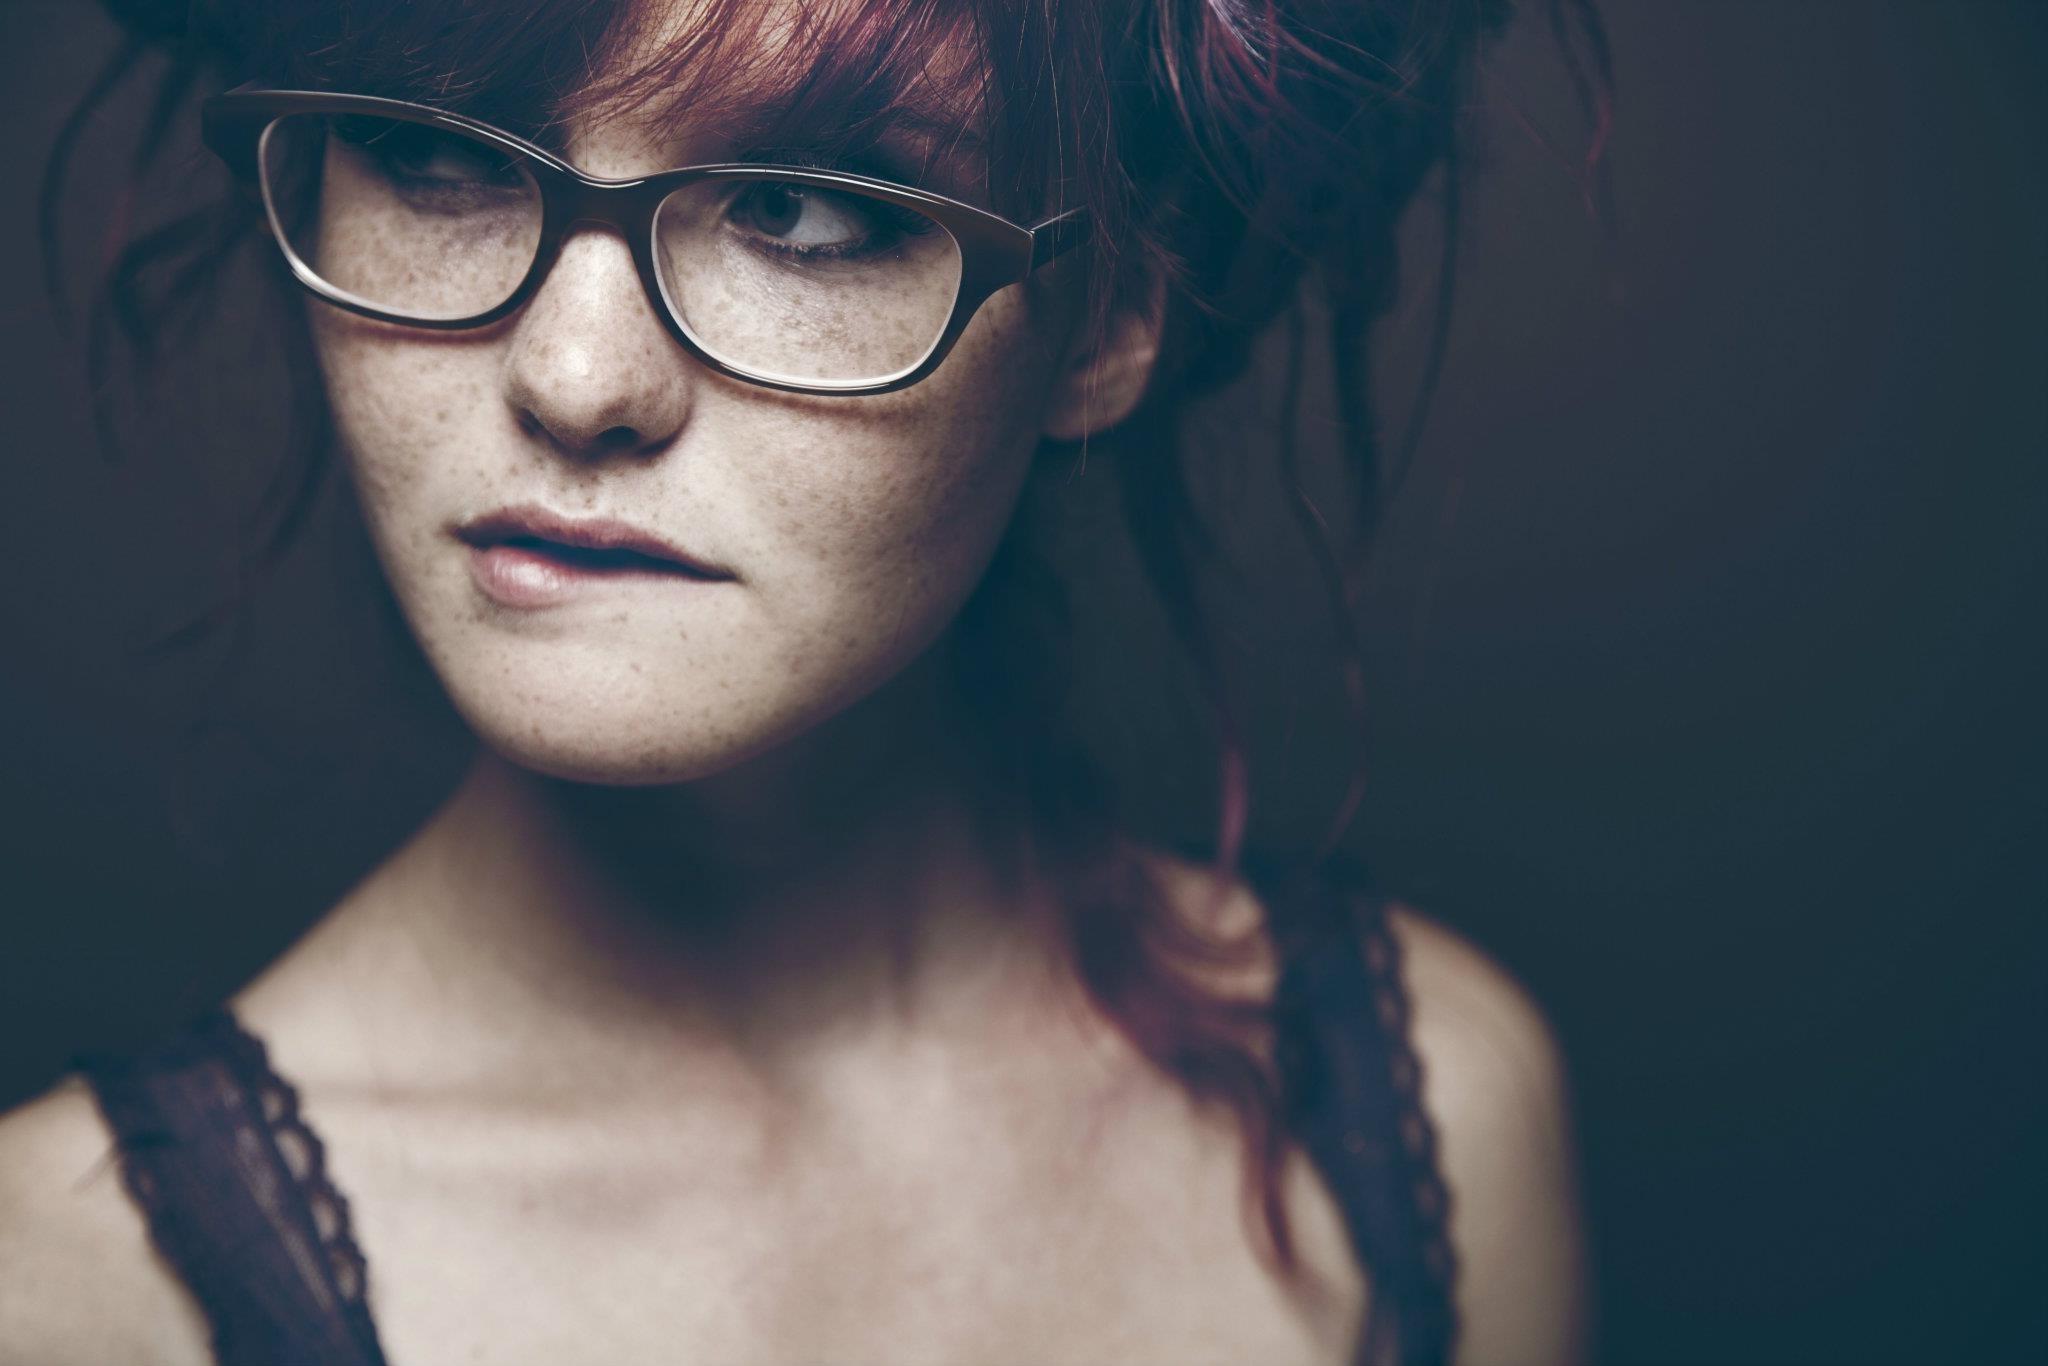 Wallpaper Face Black Redhead Model Sunglasses Glasses Blue